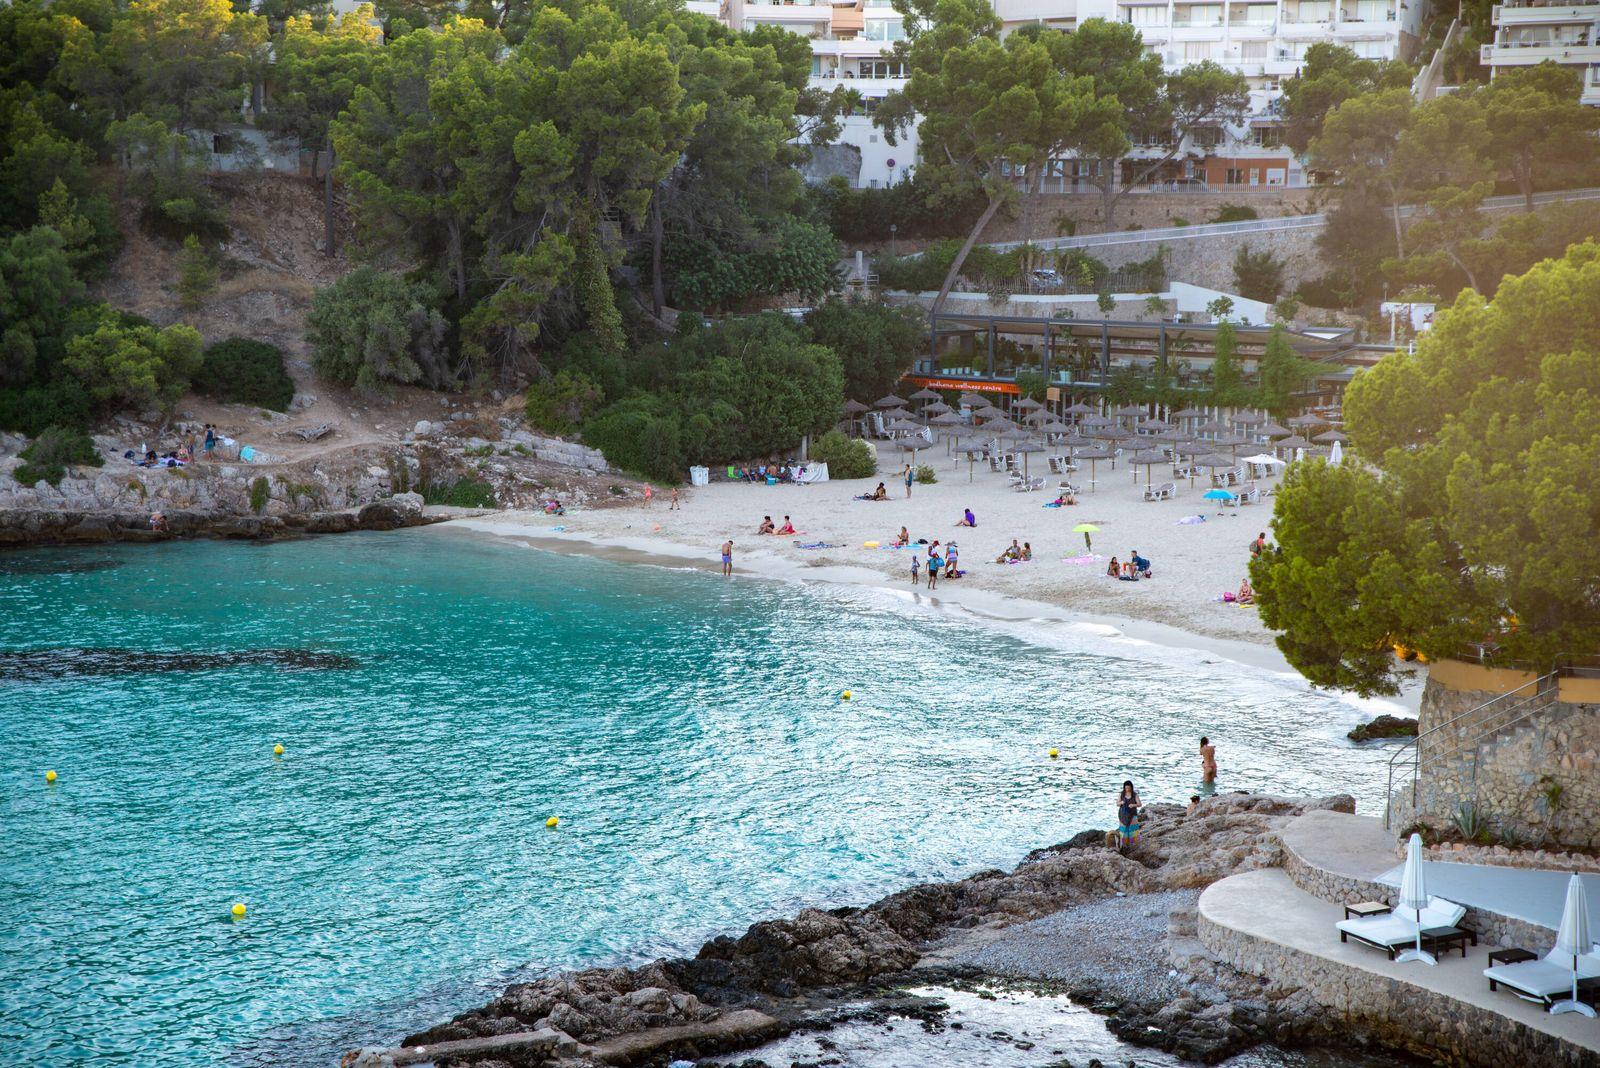 20200824 Mallorca after travel warning CAMPOS, SPAIN - AUGUST 24 2020 : Playa Illetas at - Mallorca after travel warnin